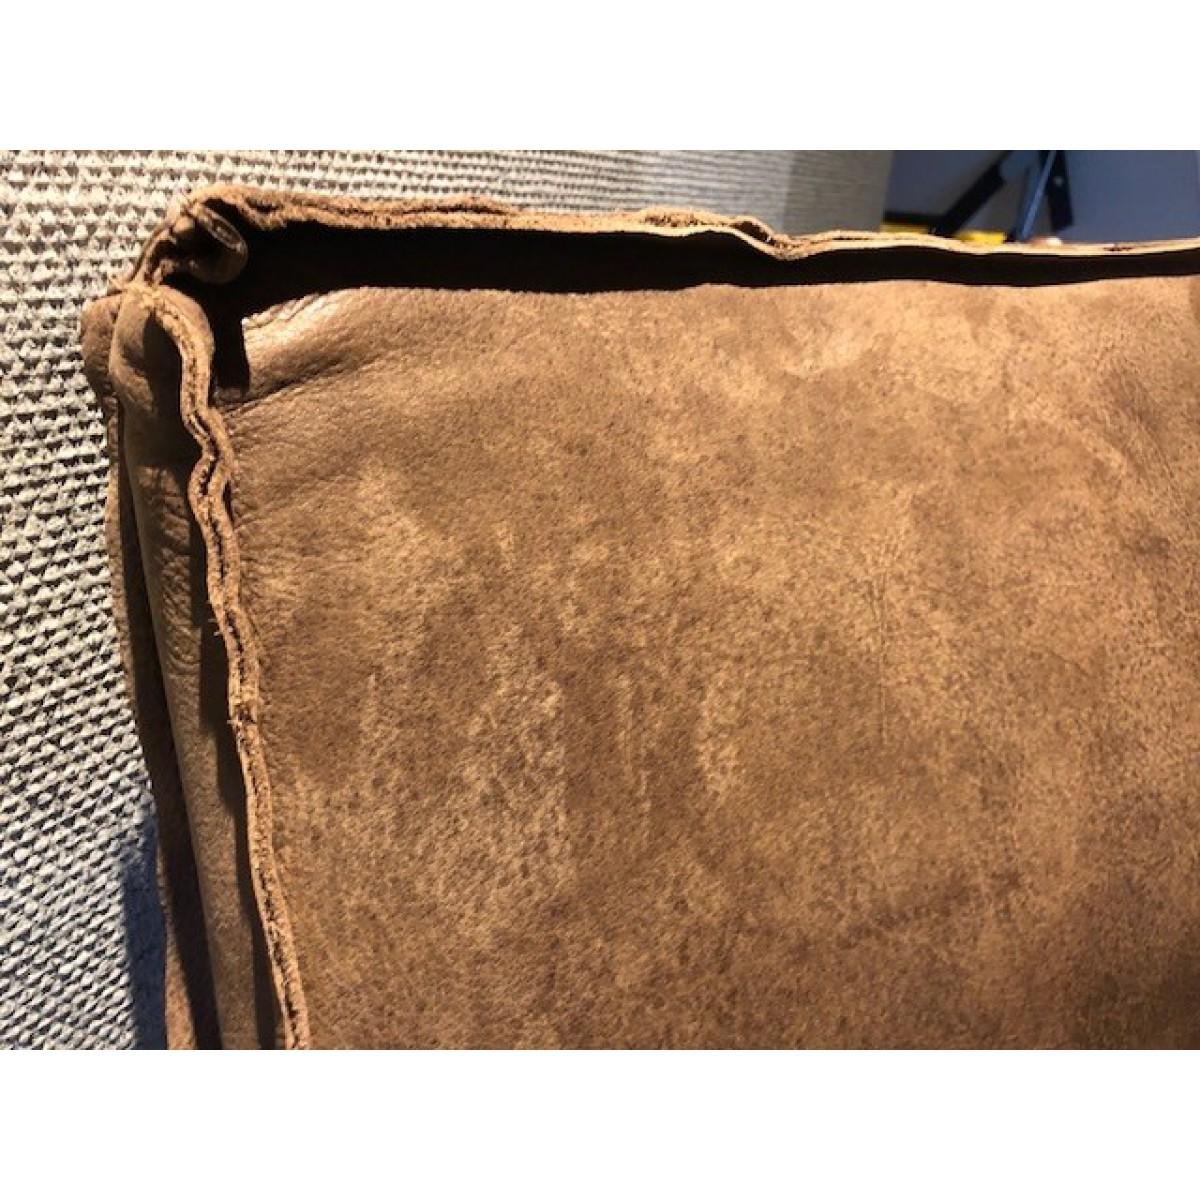 romy-metaalframe-stoel-armleuning-leer-kenia-miltonhouse